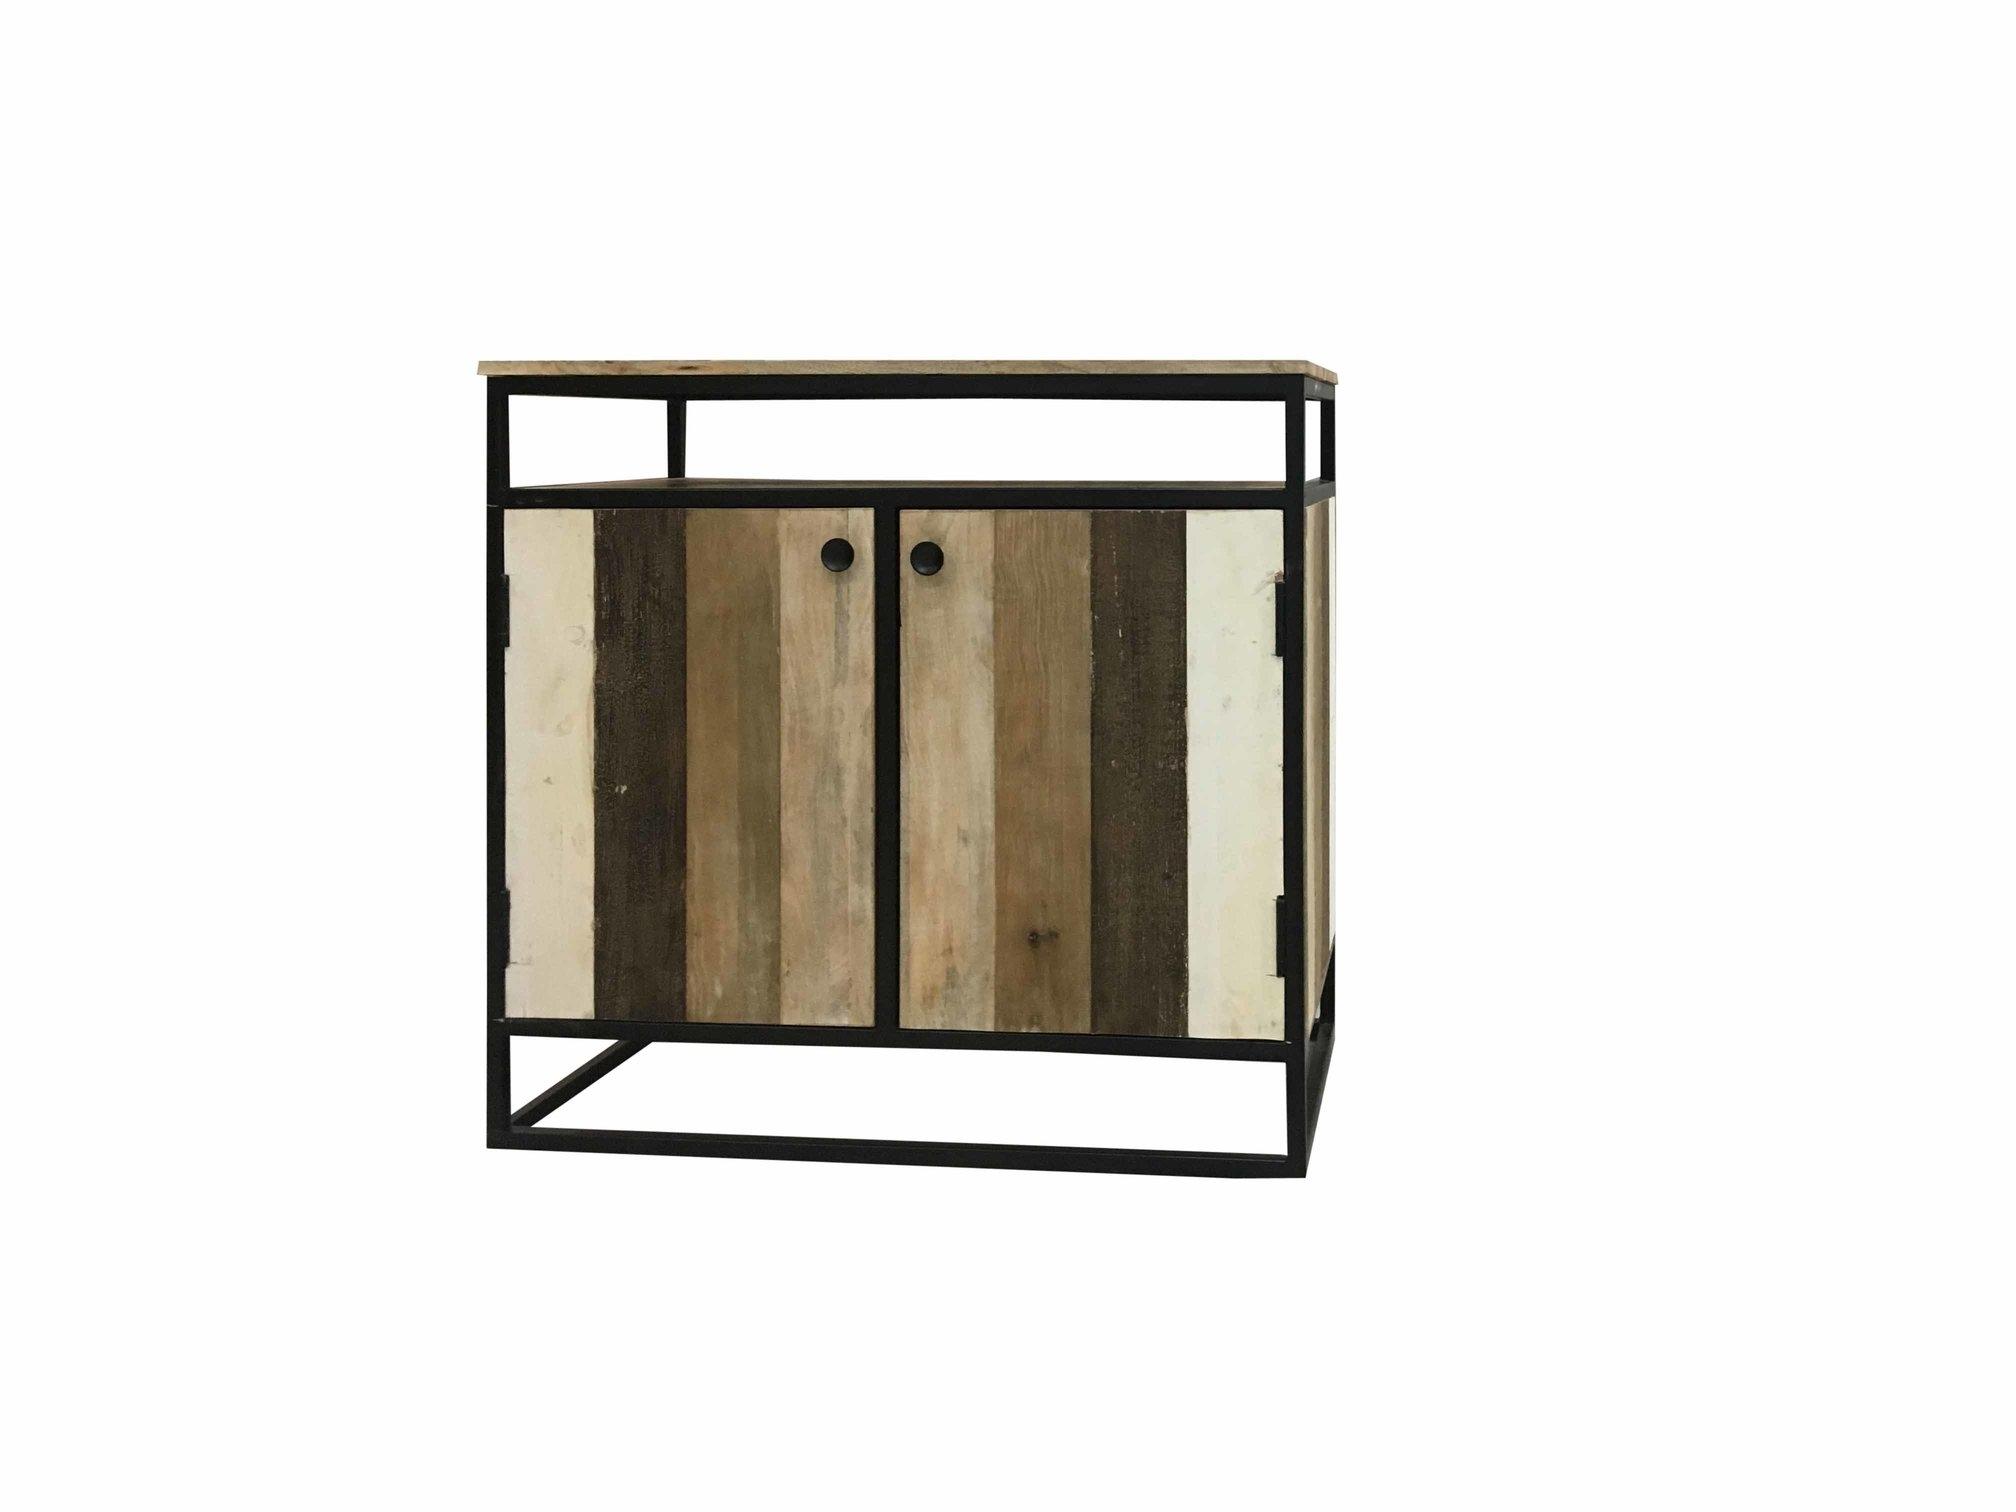 Industrial Reclaimed Mango Wood 2-Door Sideboard With Metal Frame intended for Metal Framed Reclaimed Wood Sideboards (Image 13 of 30)